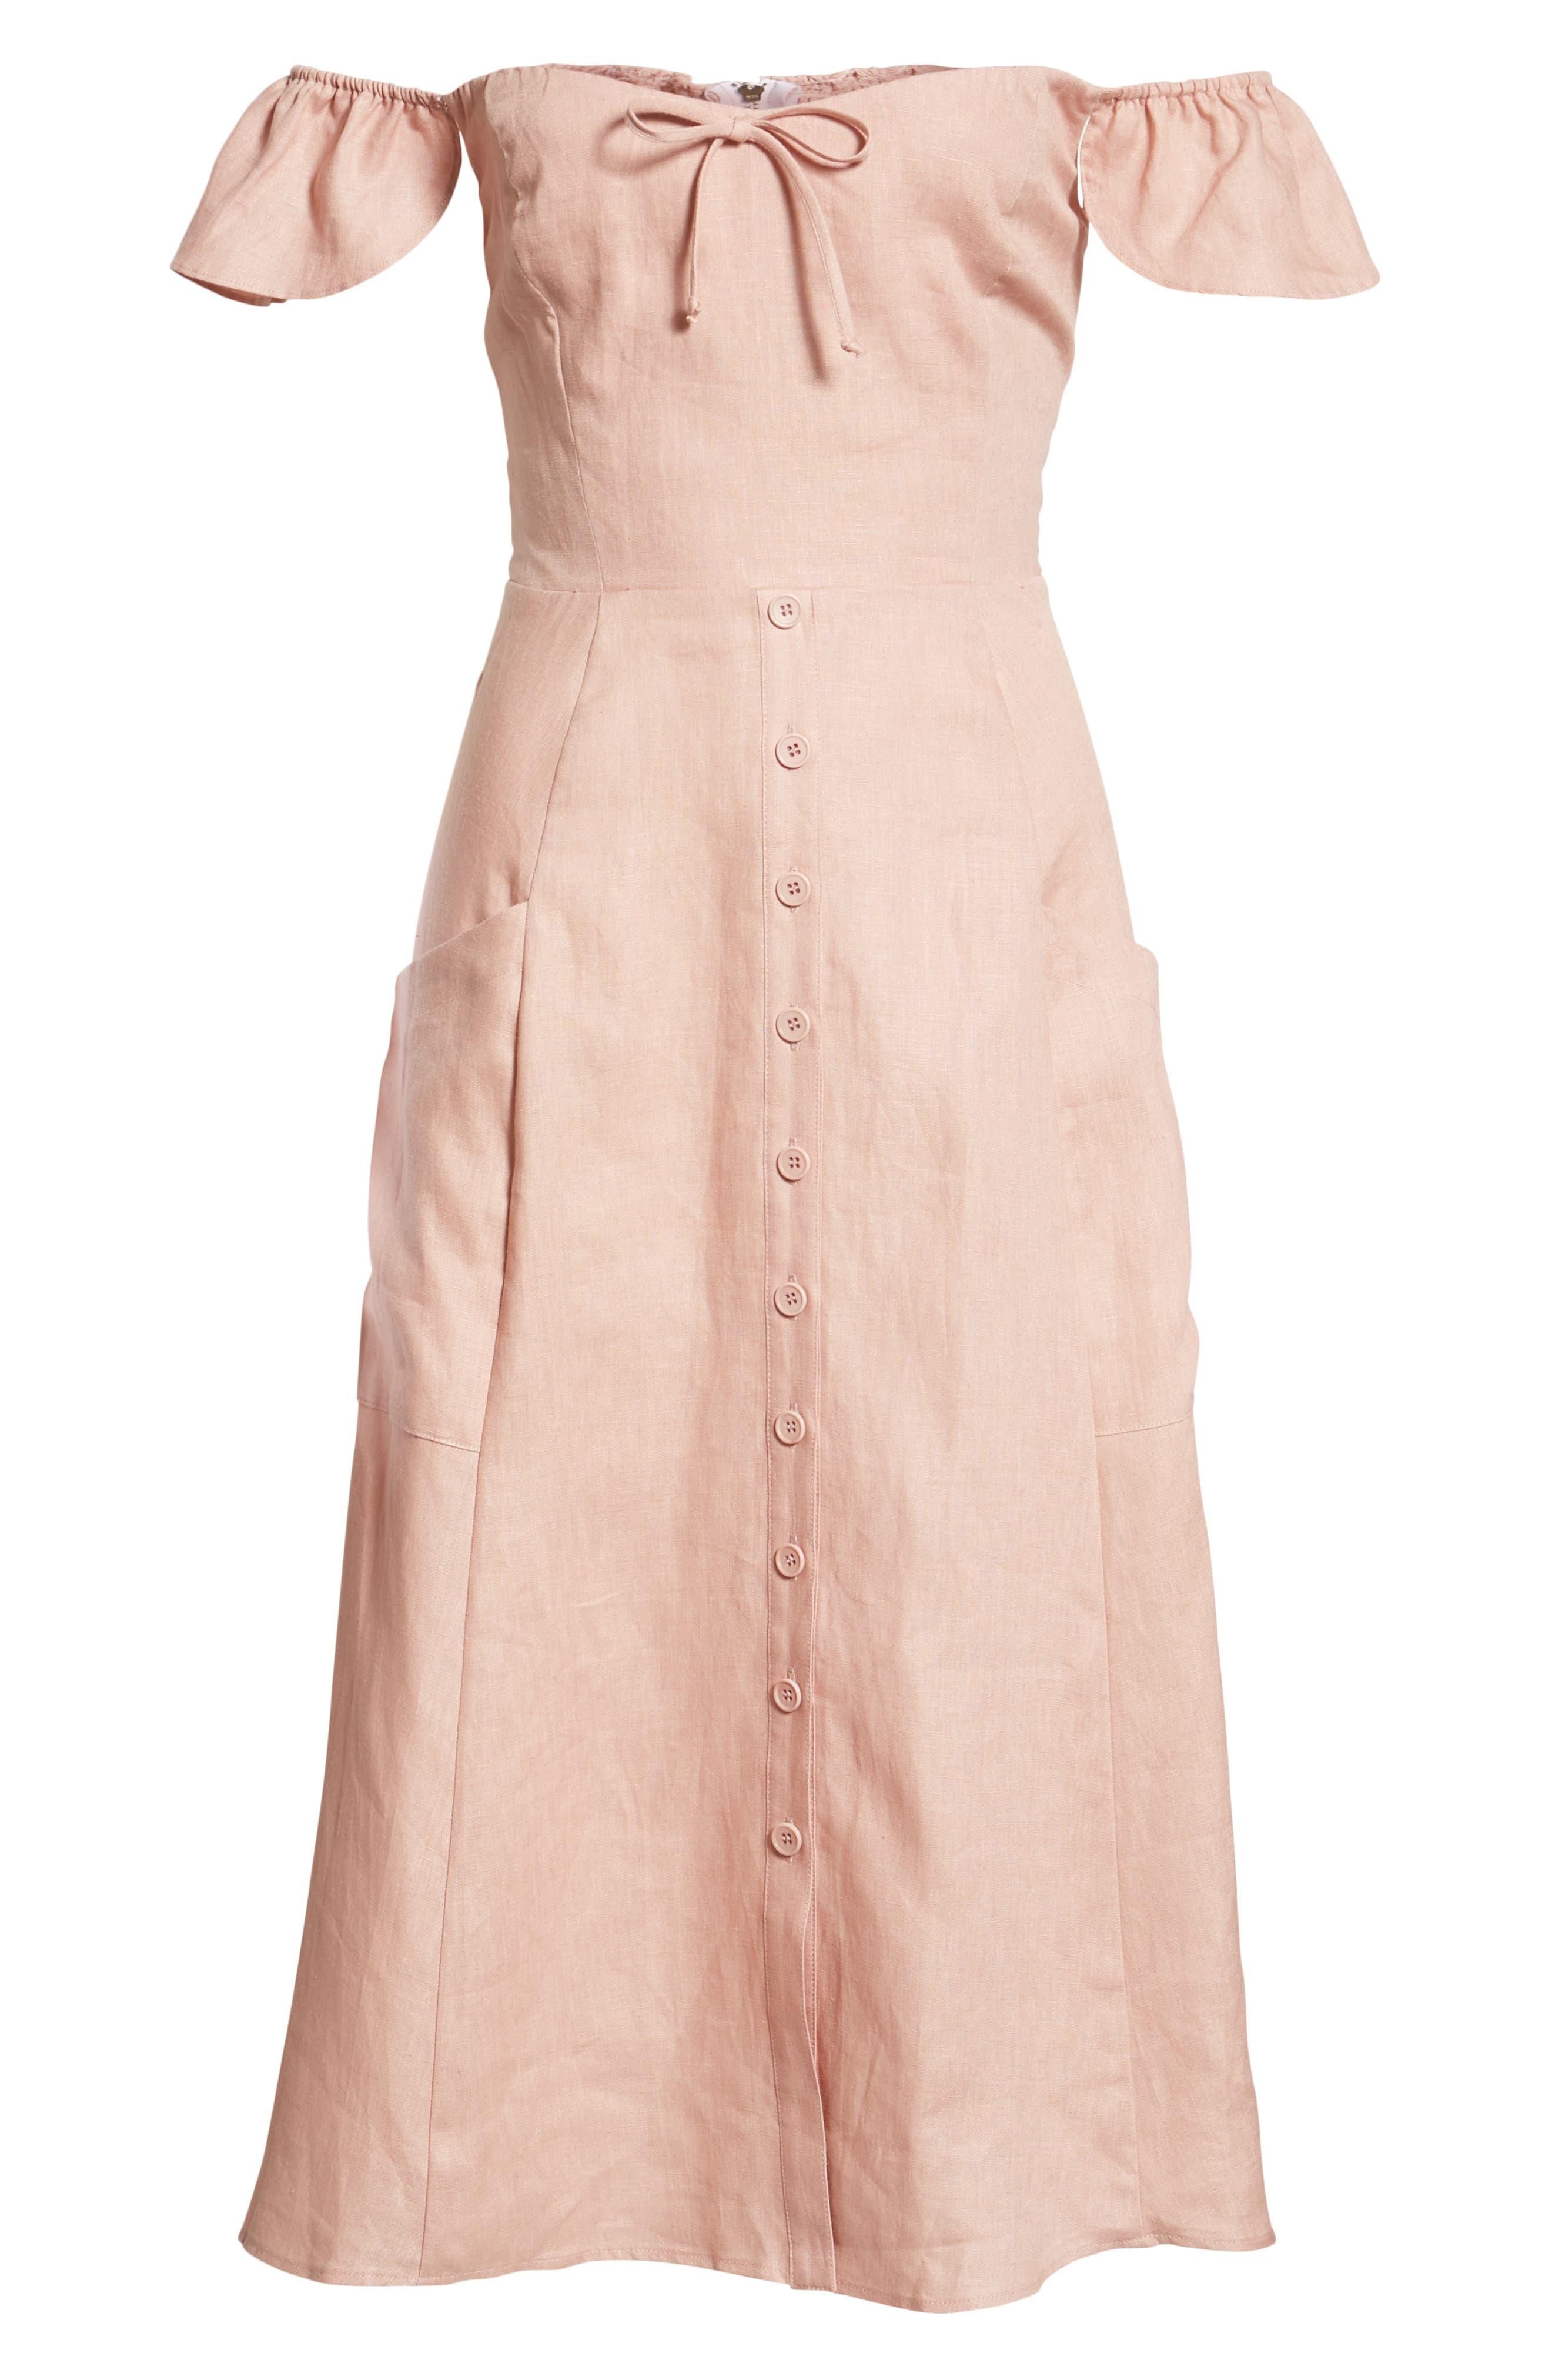 Francis Prairie A-Line Dress,                             Alternate thumbnail 6, color,                             650